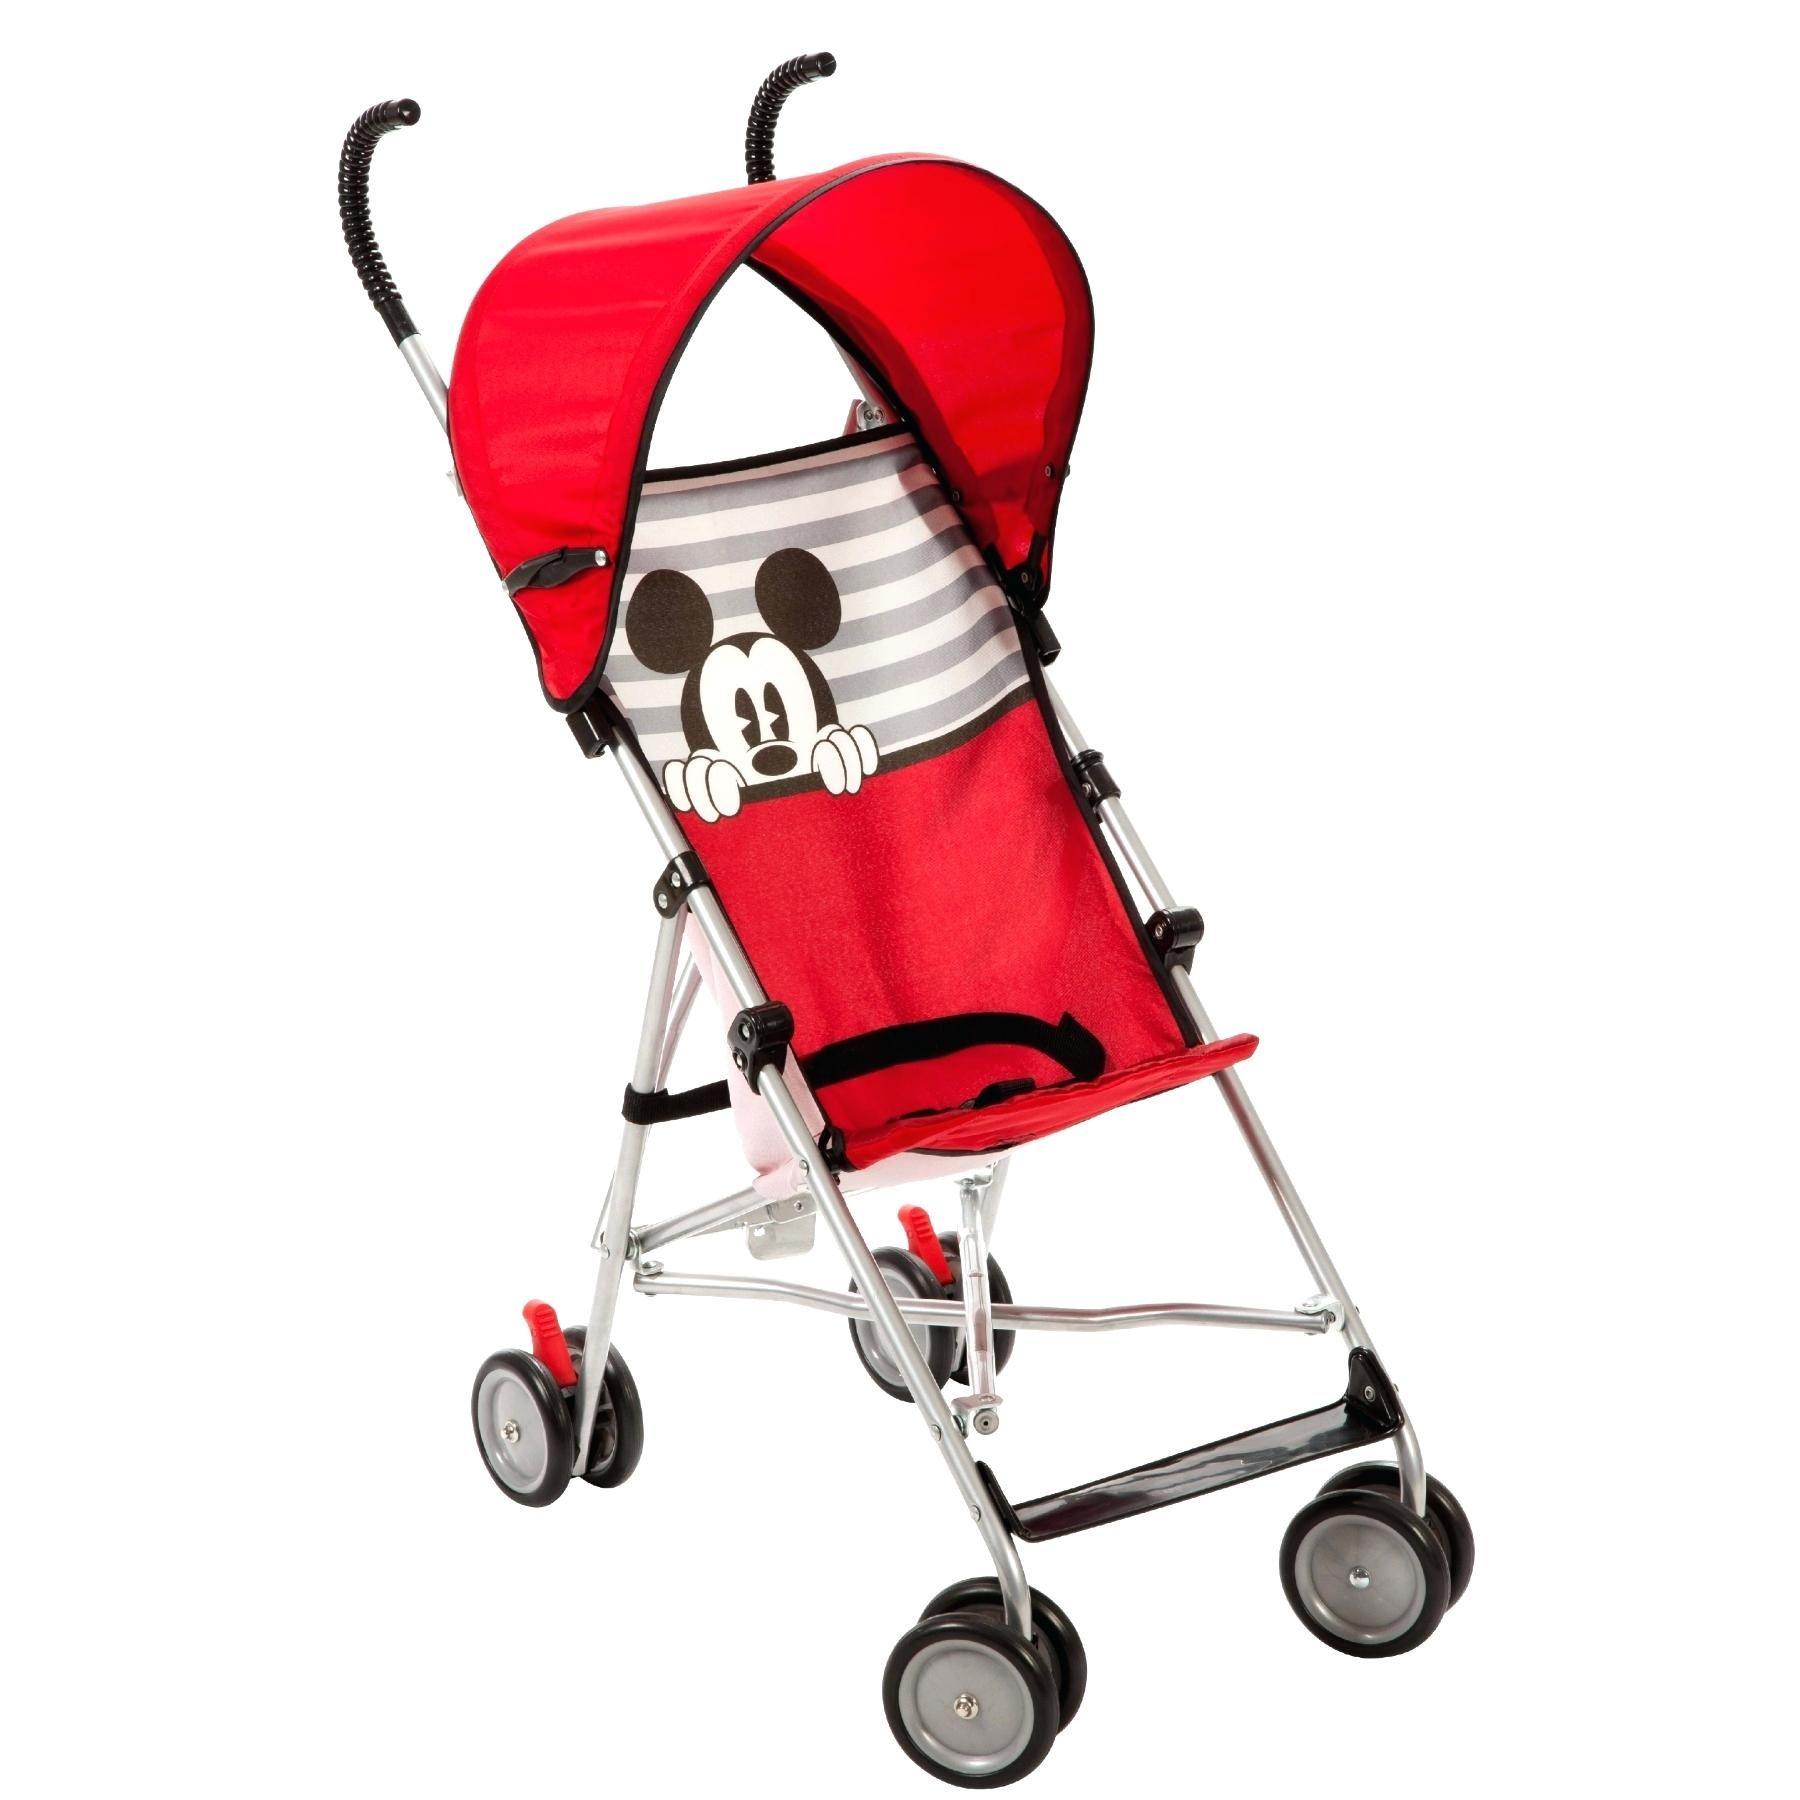 Disney Umbrella Stroller with Canopy Princess Cinderella Disney Baby Product Baby Products Pinterest